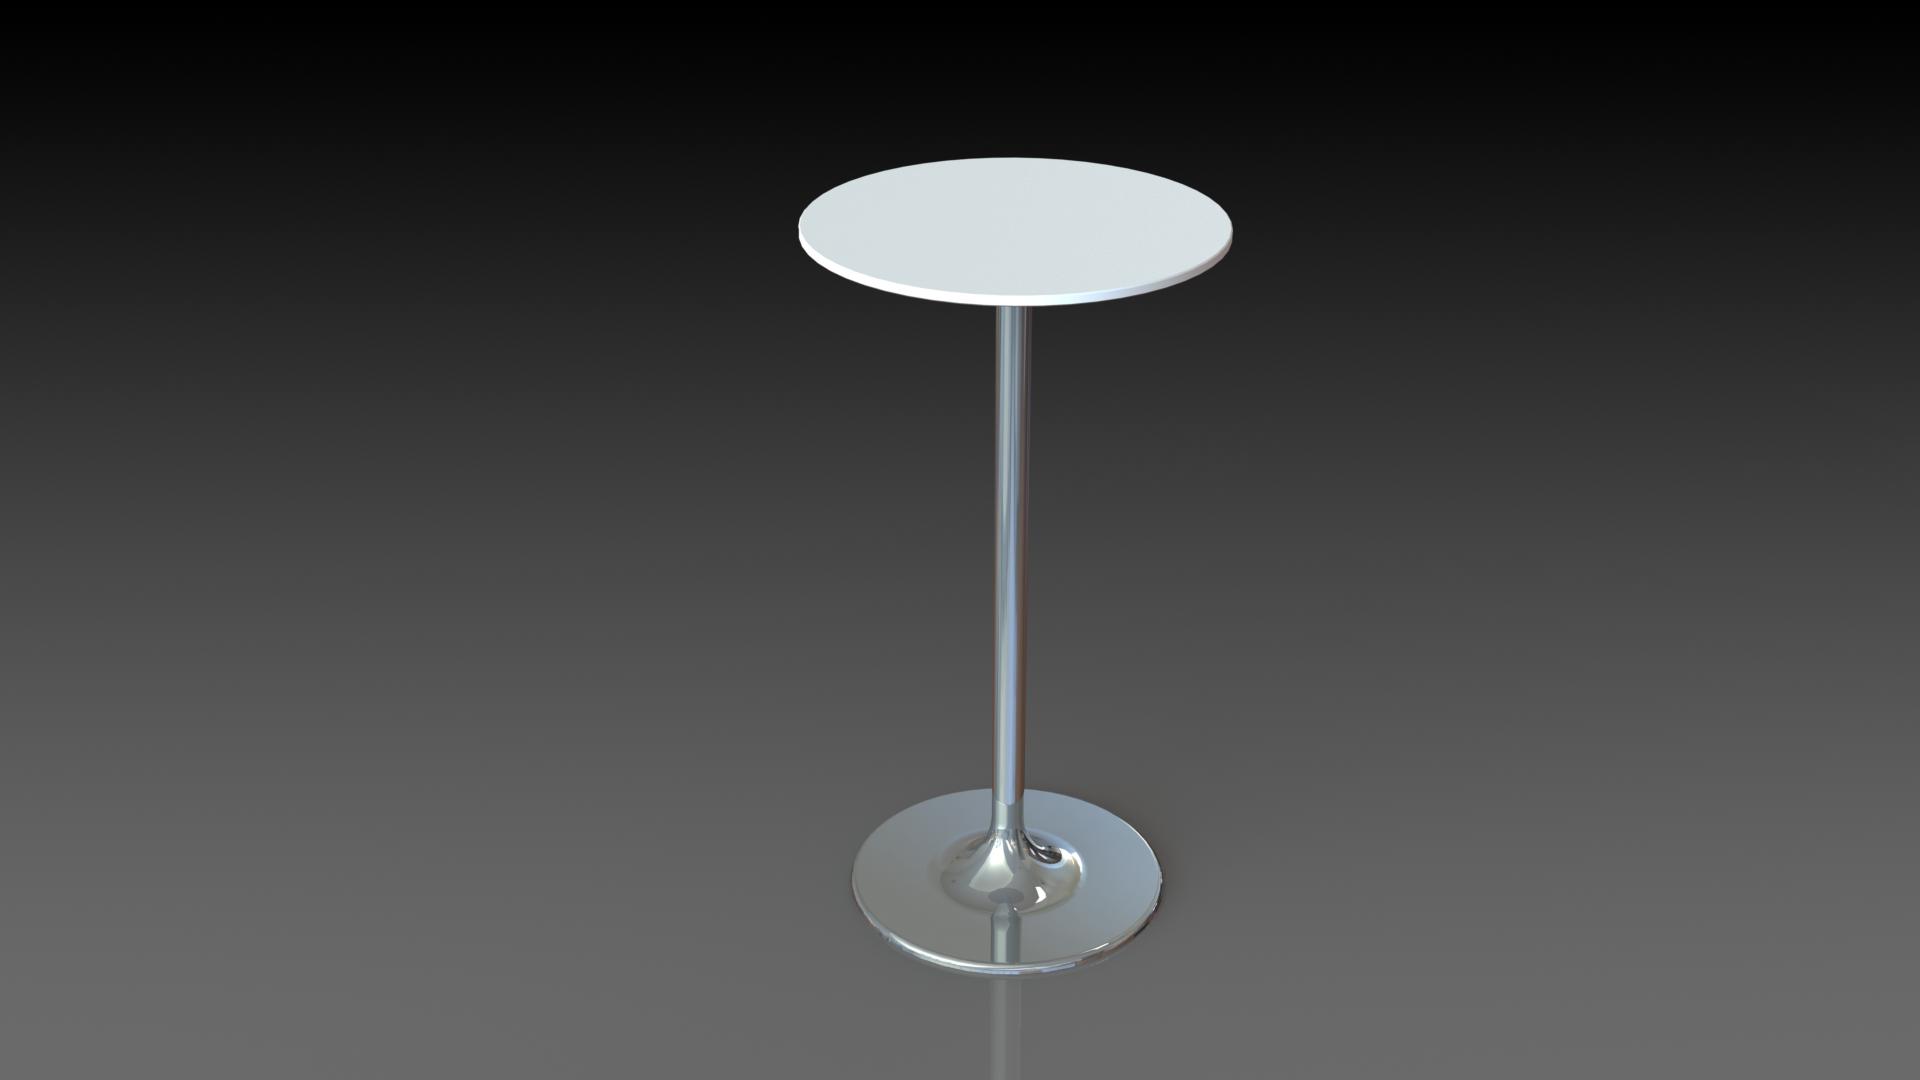 Ref: Mesa coctelera blanca